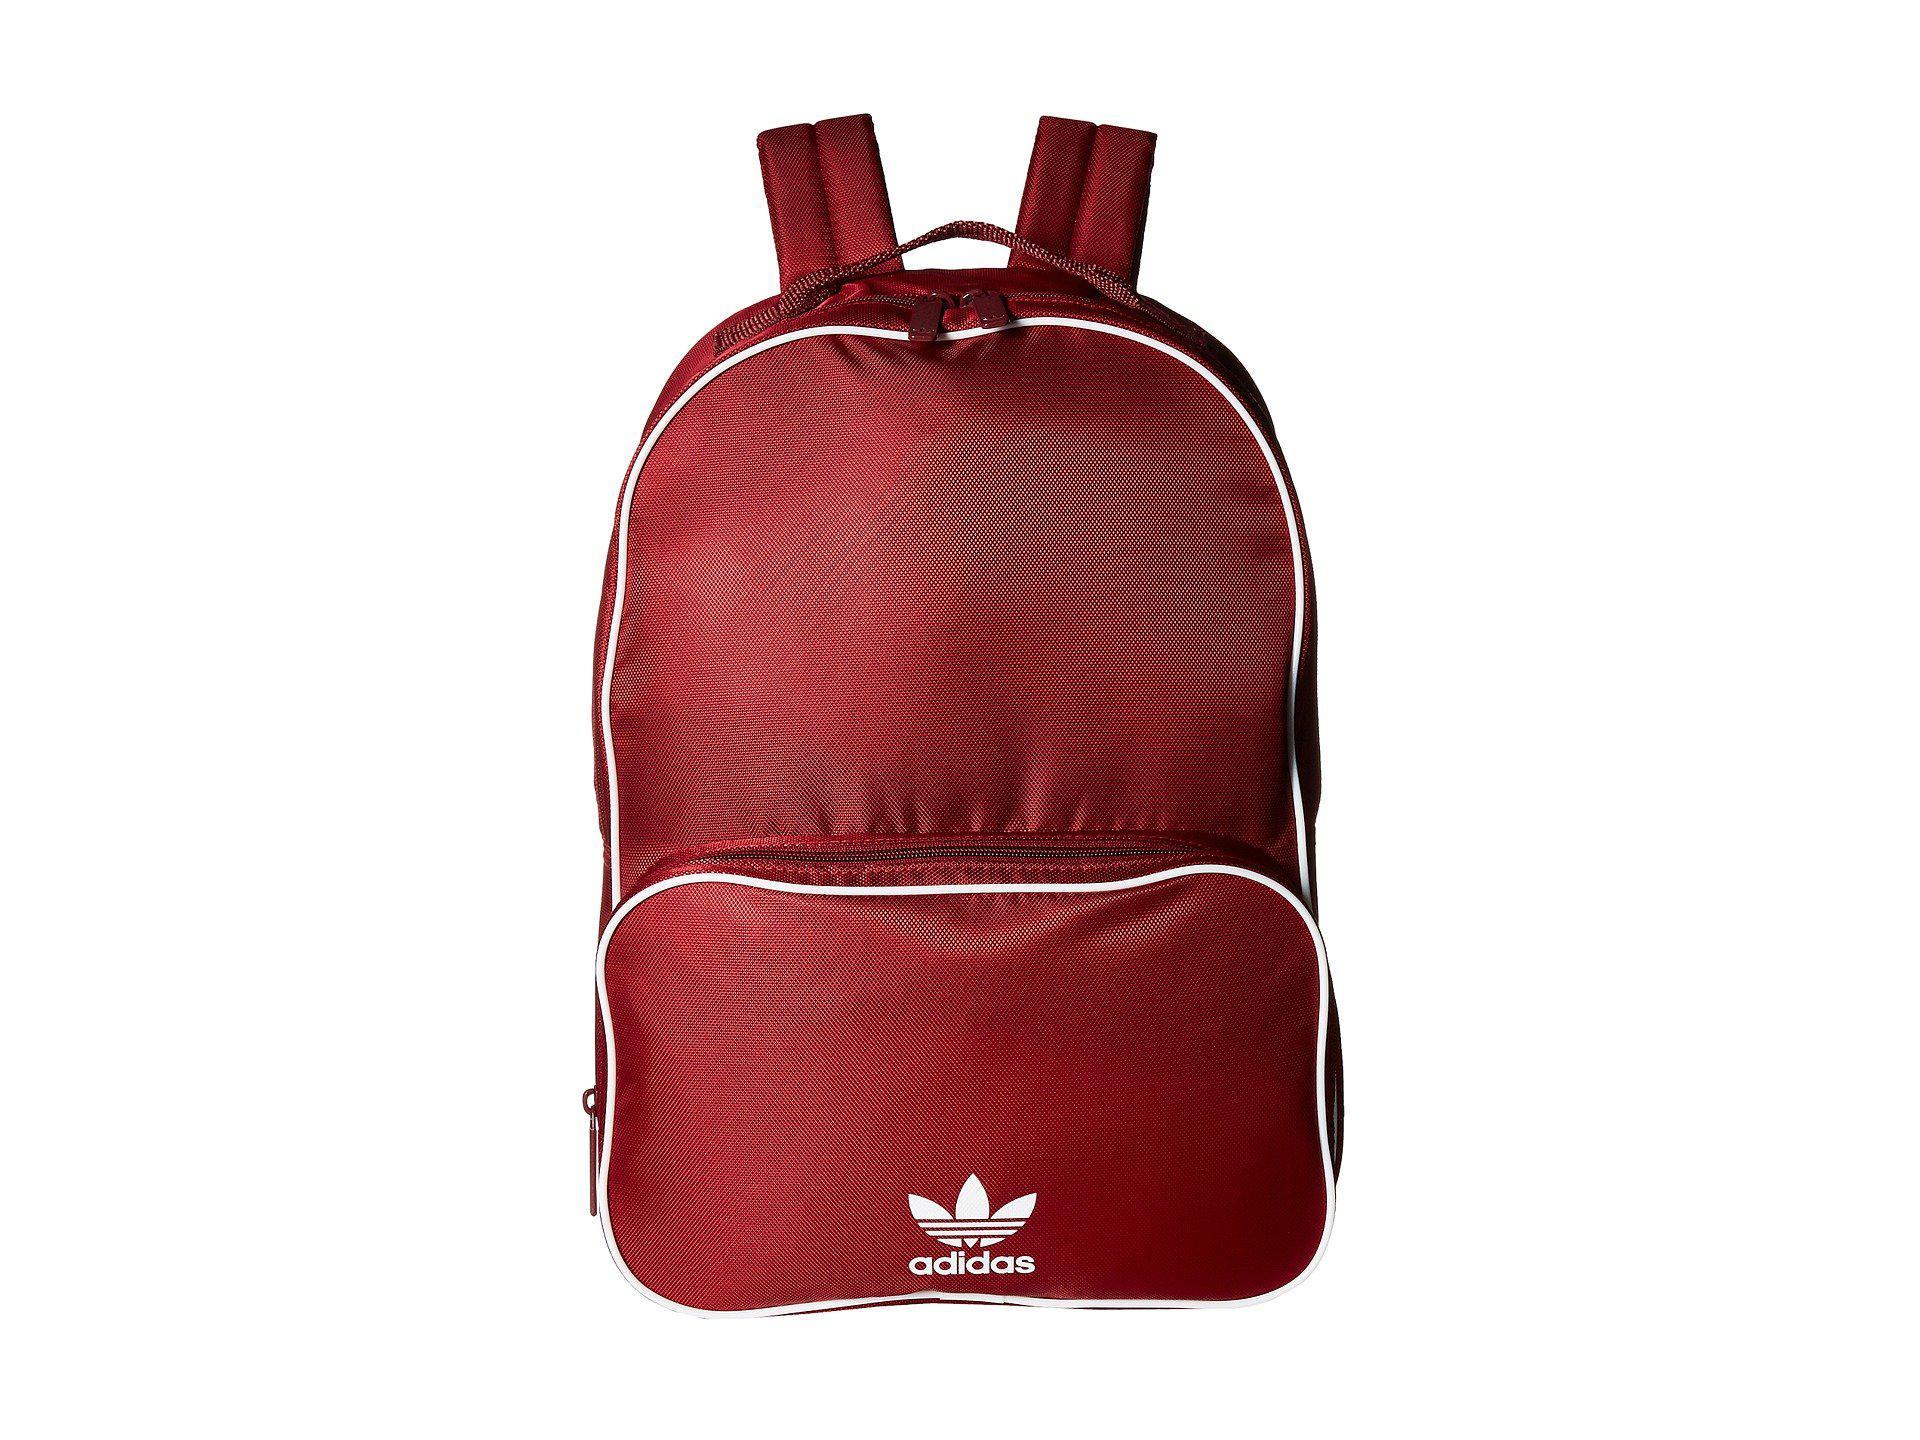 4bd1d7f02954 Adidas Classic Backpack Burgundy- Fenix Toulouse Handball